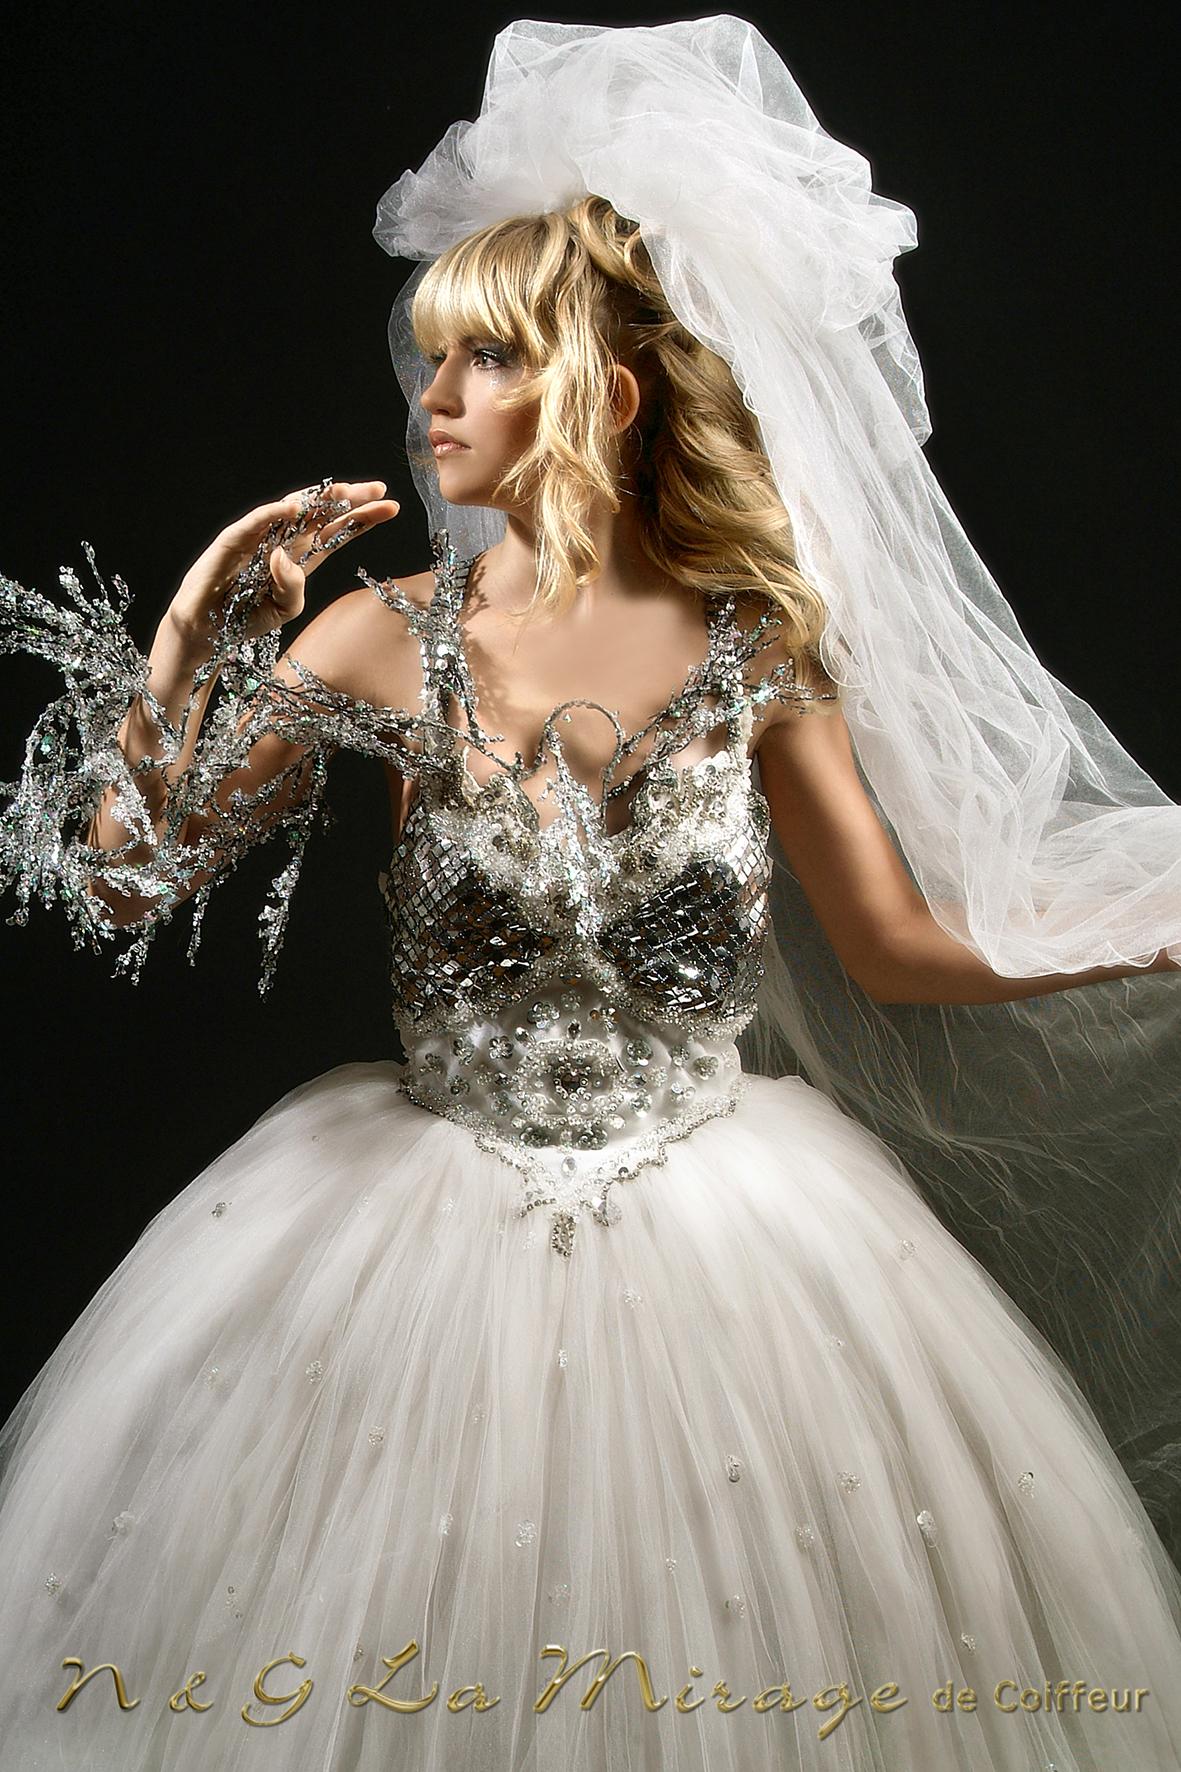 Hochzeitsfrisuren La Mirage De Coiffeur